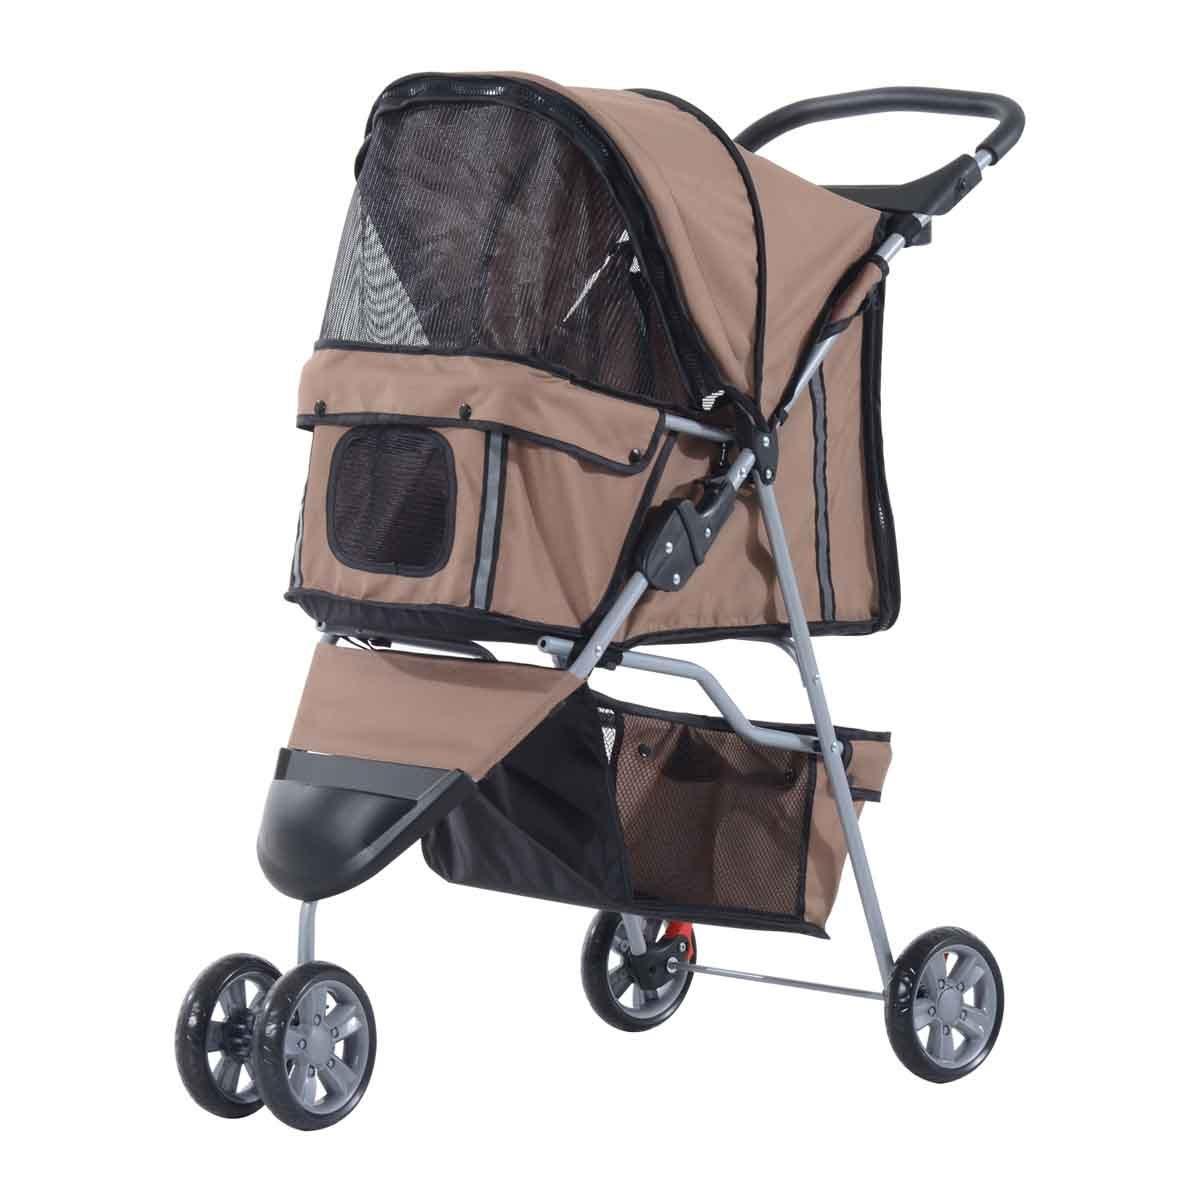 PawHut 3 Wheel Pet Stroller Pram - Coffee